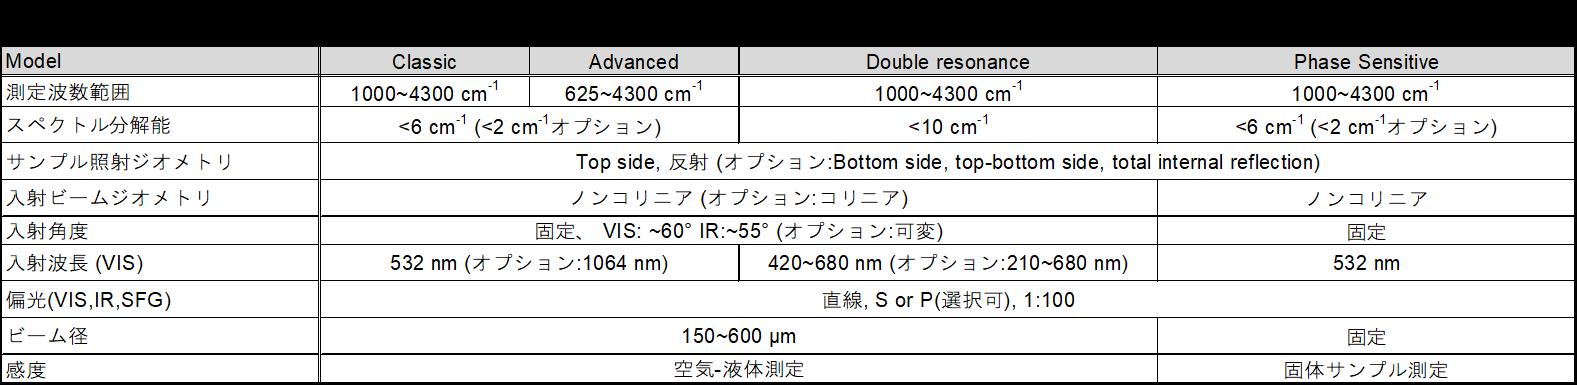 SFG分光システム 仕様